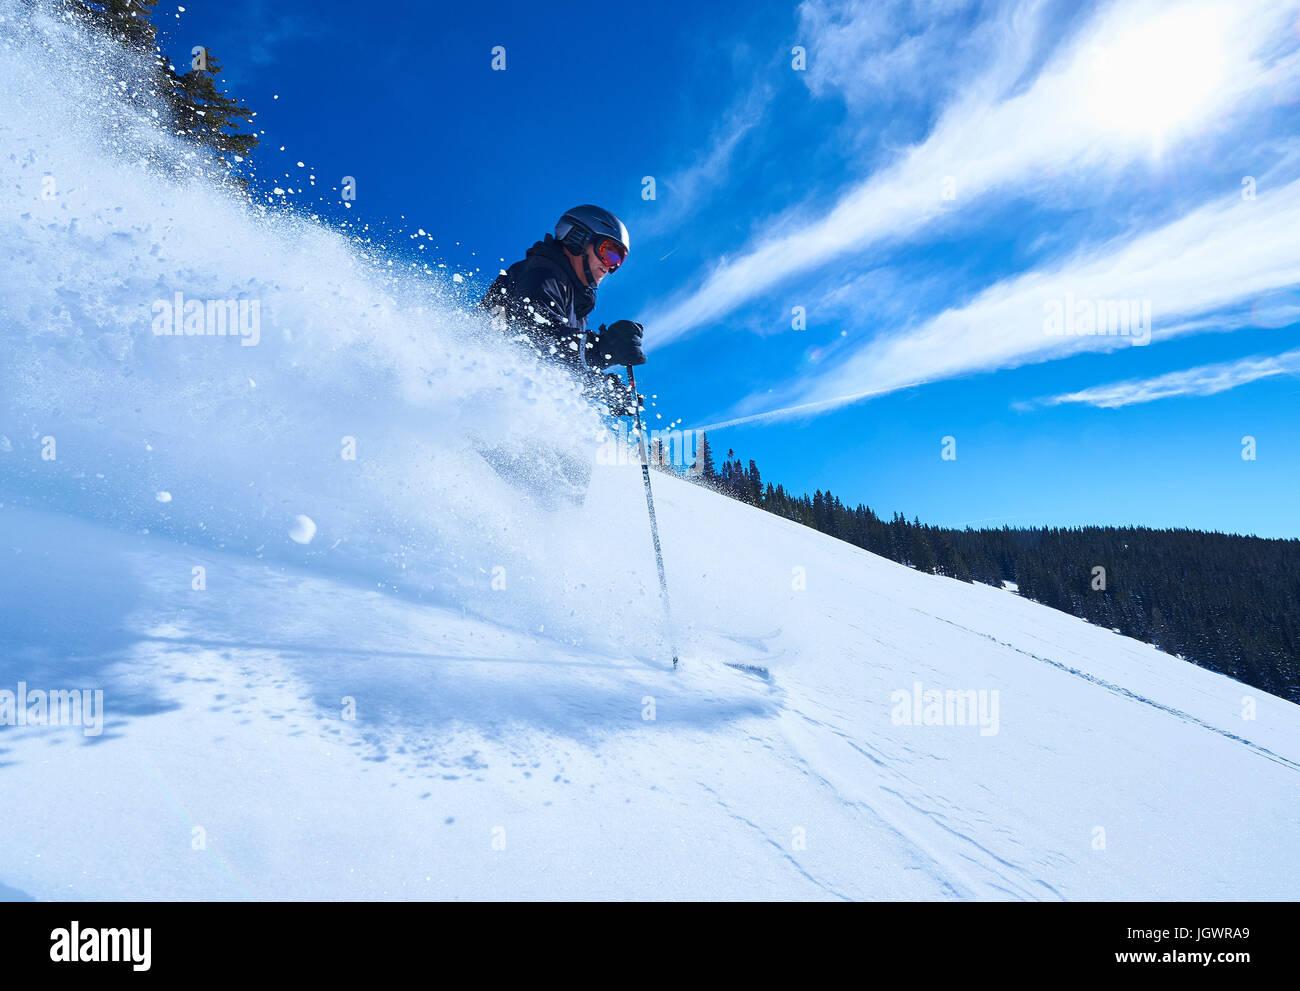 Man skiing down deep snow covered mountainside, Aspen, Colorado, USA - Stock Image